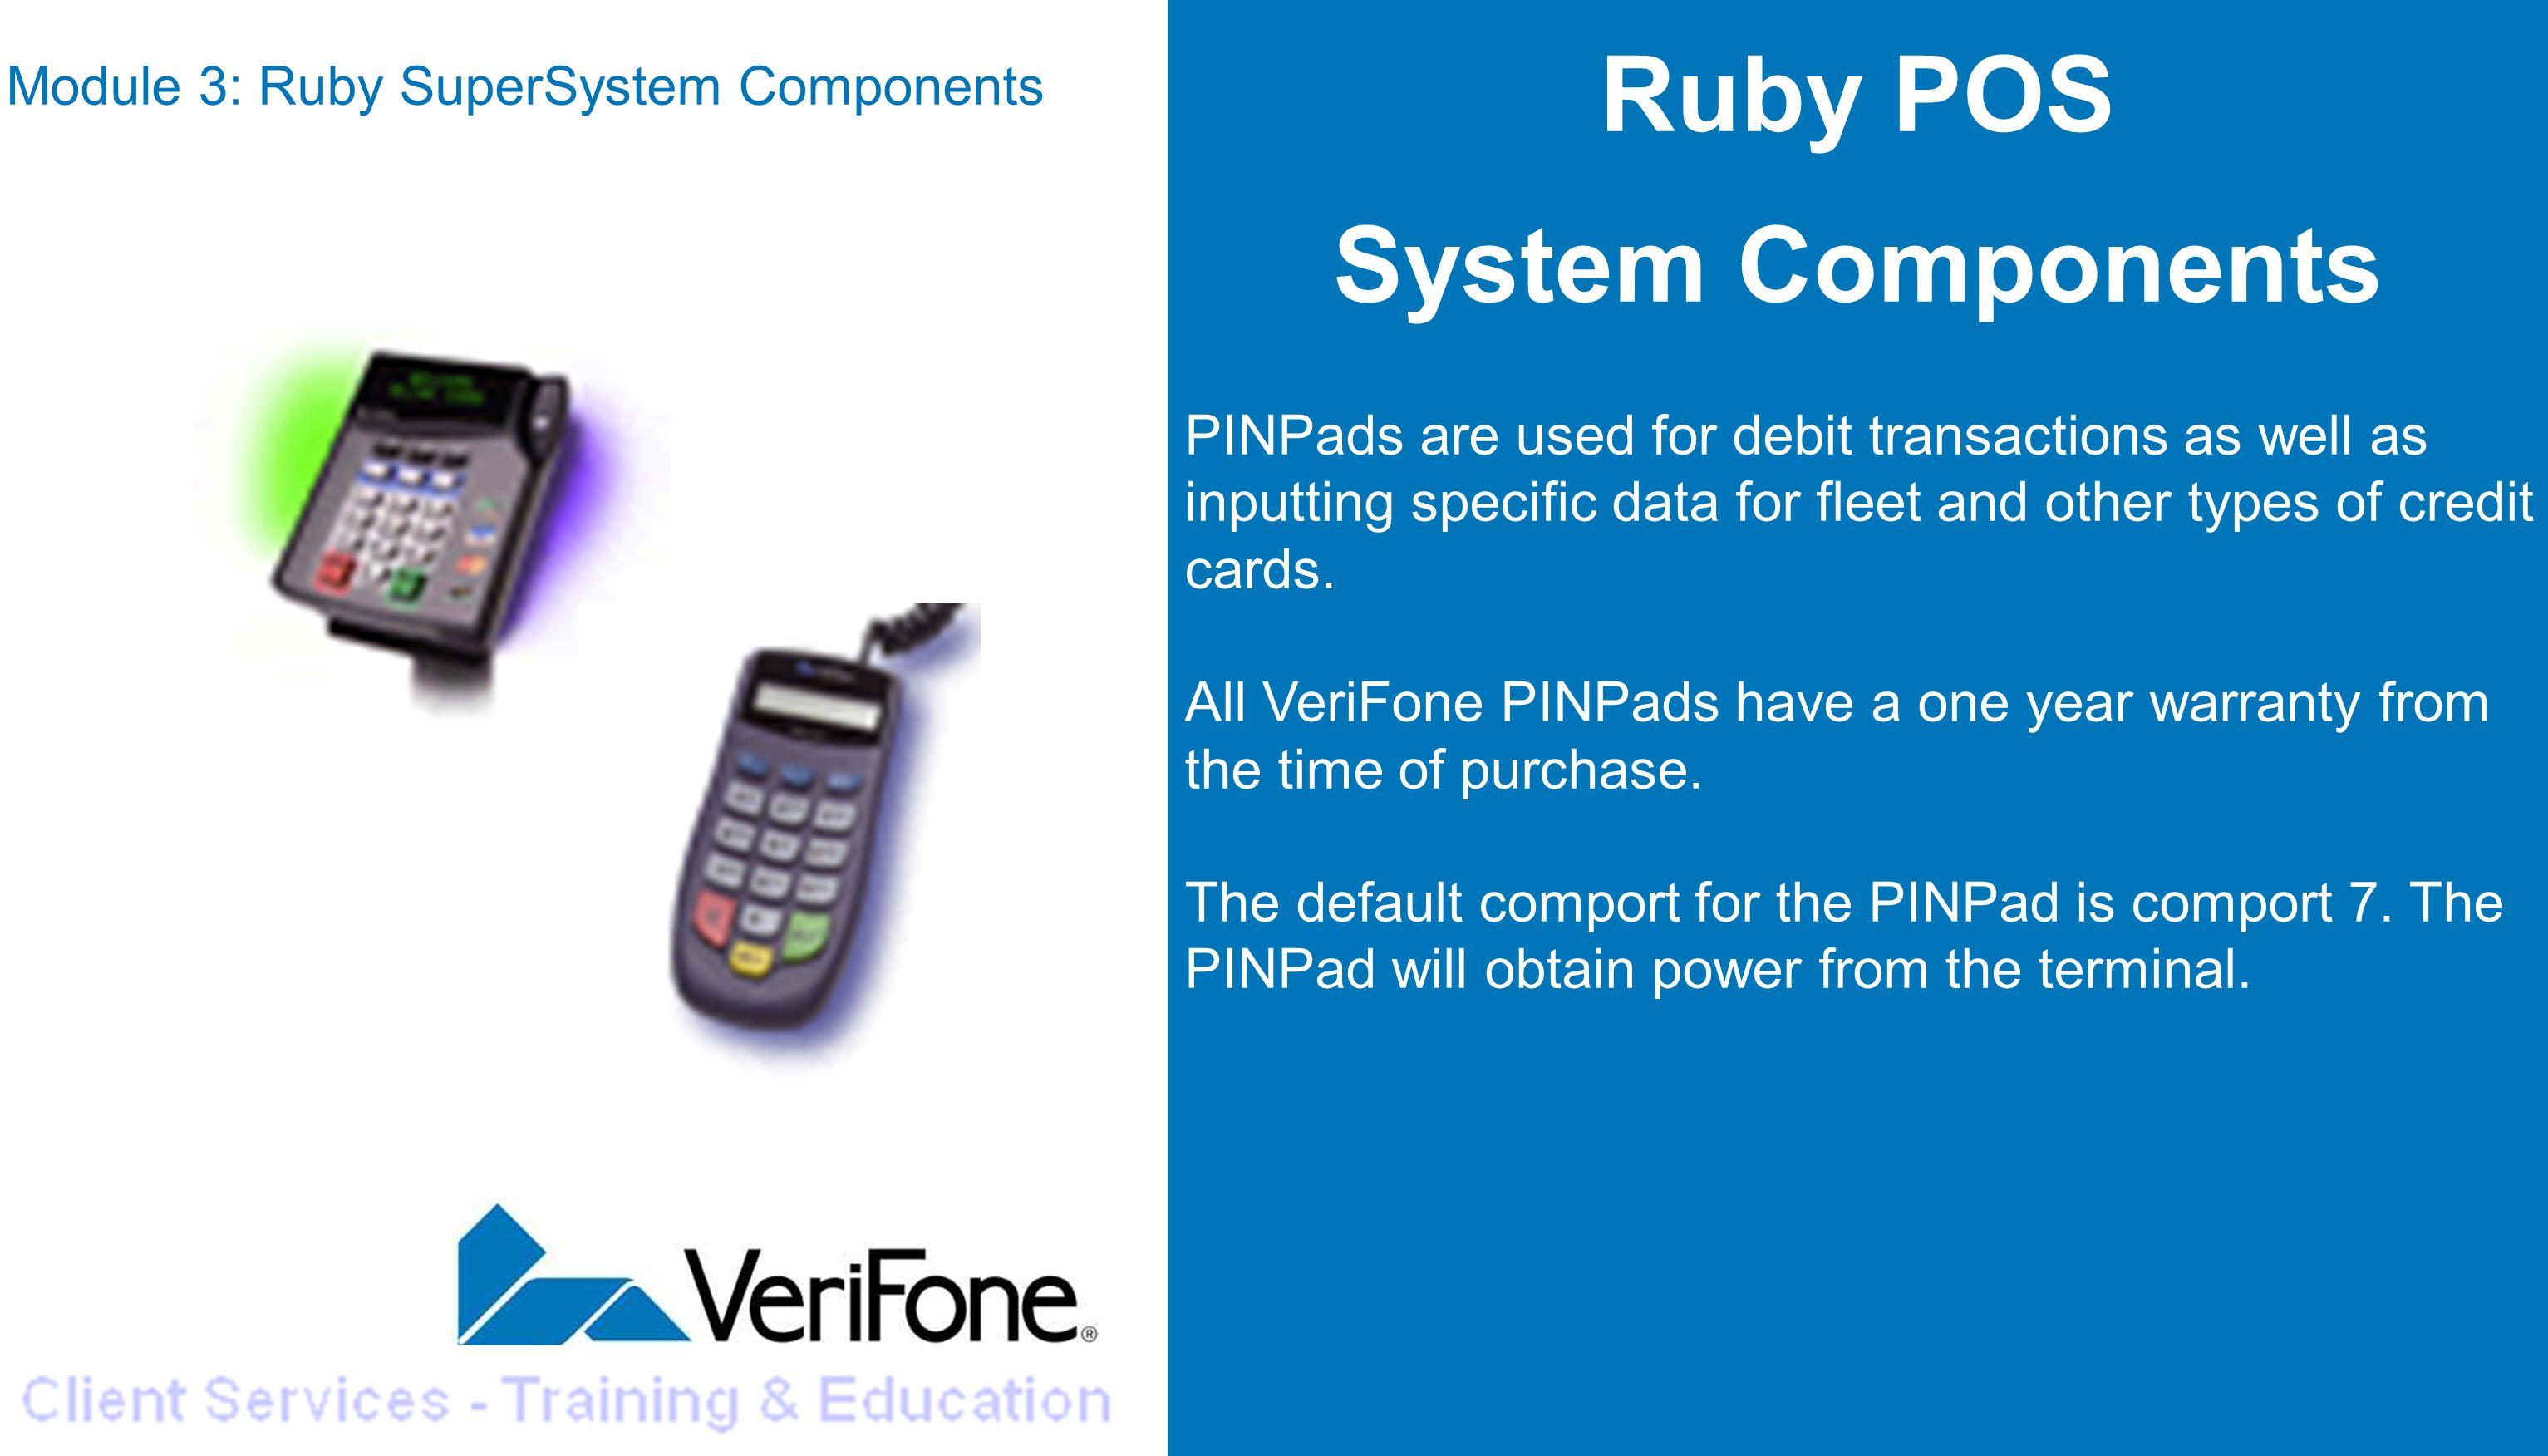 module 3 ruby supersystem components copyright 2006 verifone inc rh slideplayer com Verifone Ruby Cash Register Manual Verifone Ruby System